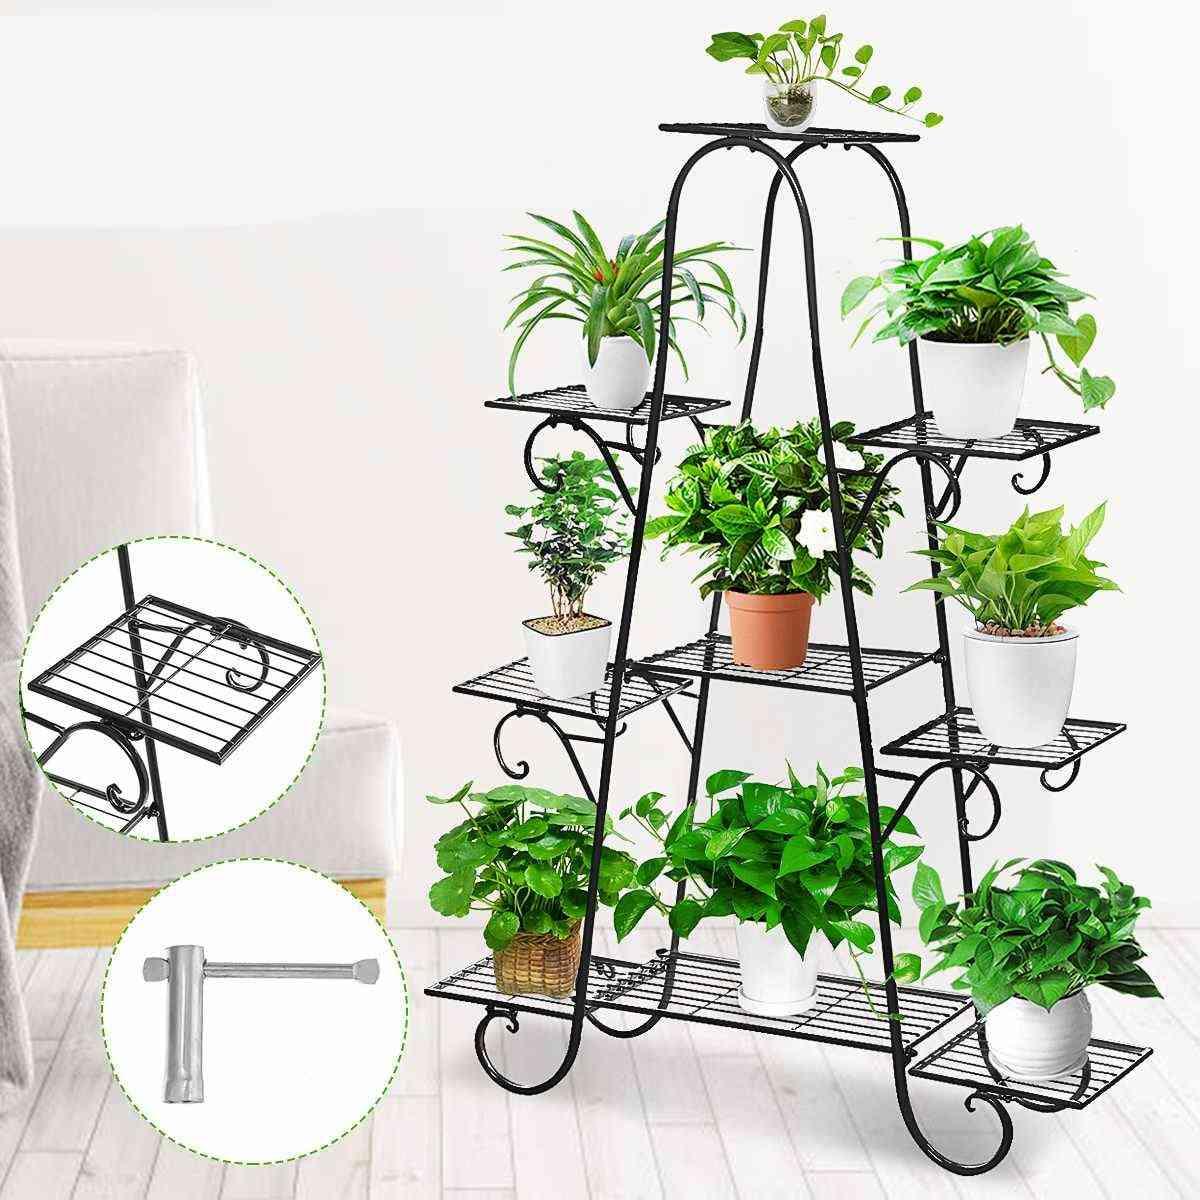 9 Tiers Metal Shelves Flower Rack Plant Stand